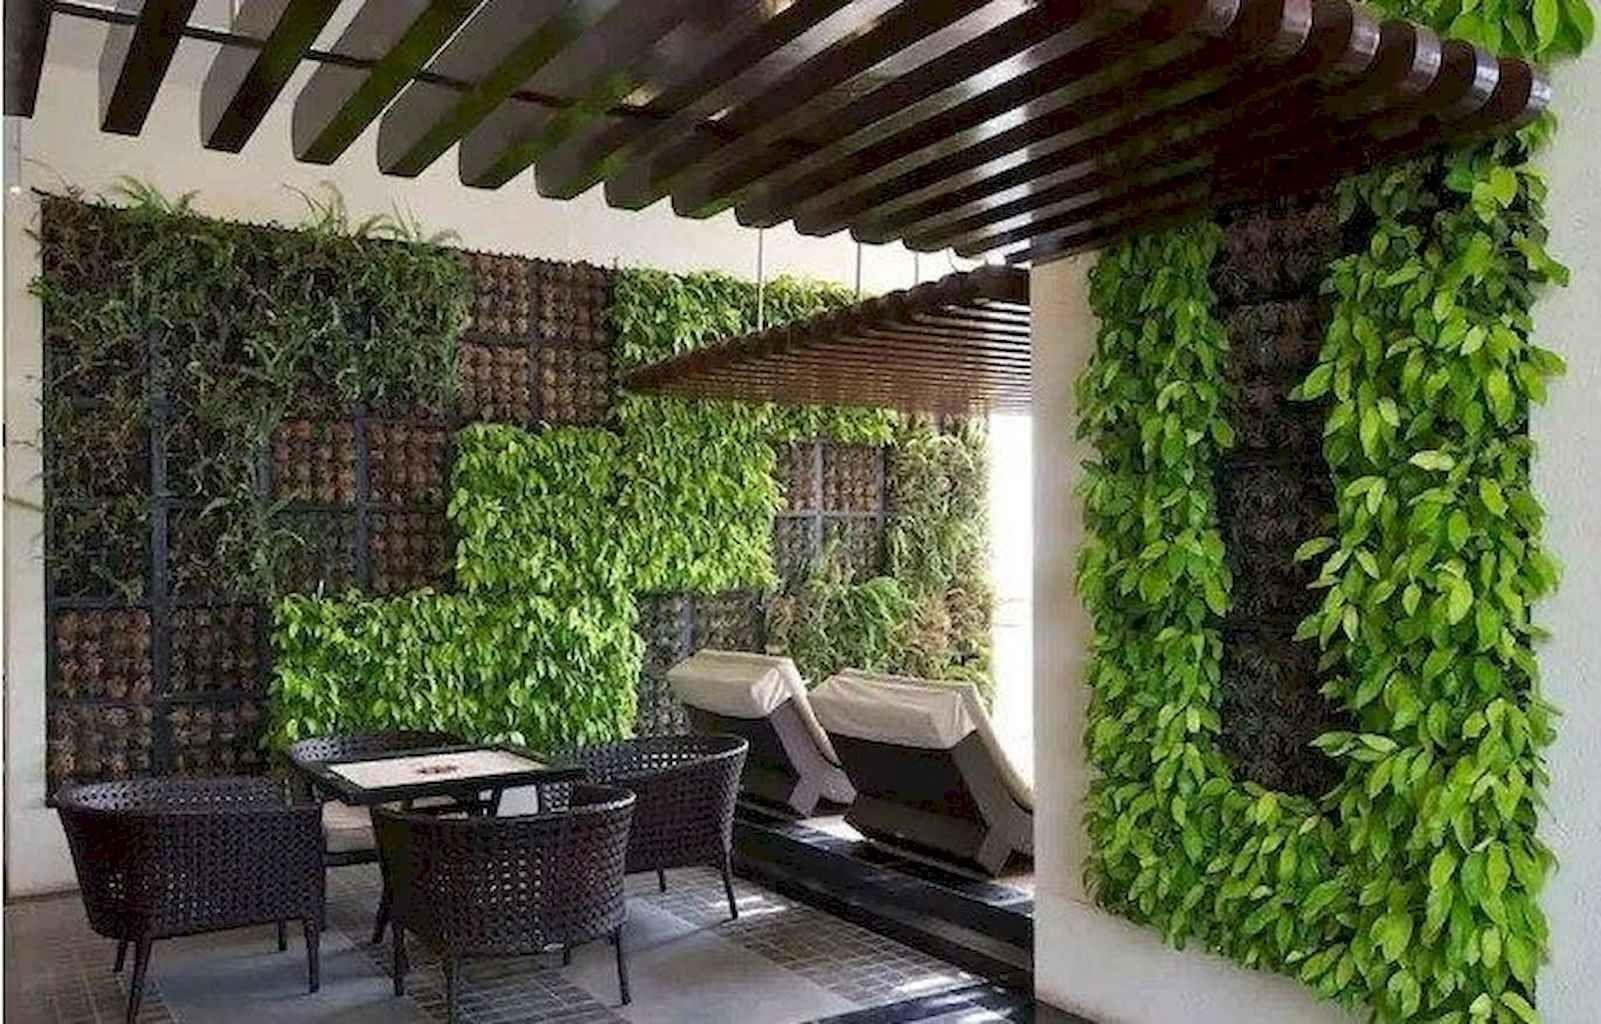 70 Fantastic Vertical Garden Indoor Decor Ideas Decoradeas Vertical Garden Vertical Garden Indoor Vertical Garden Design